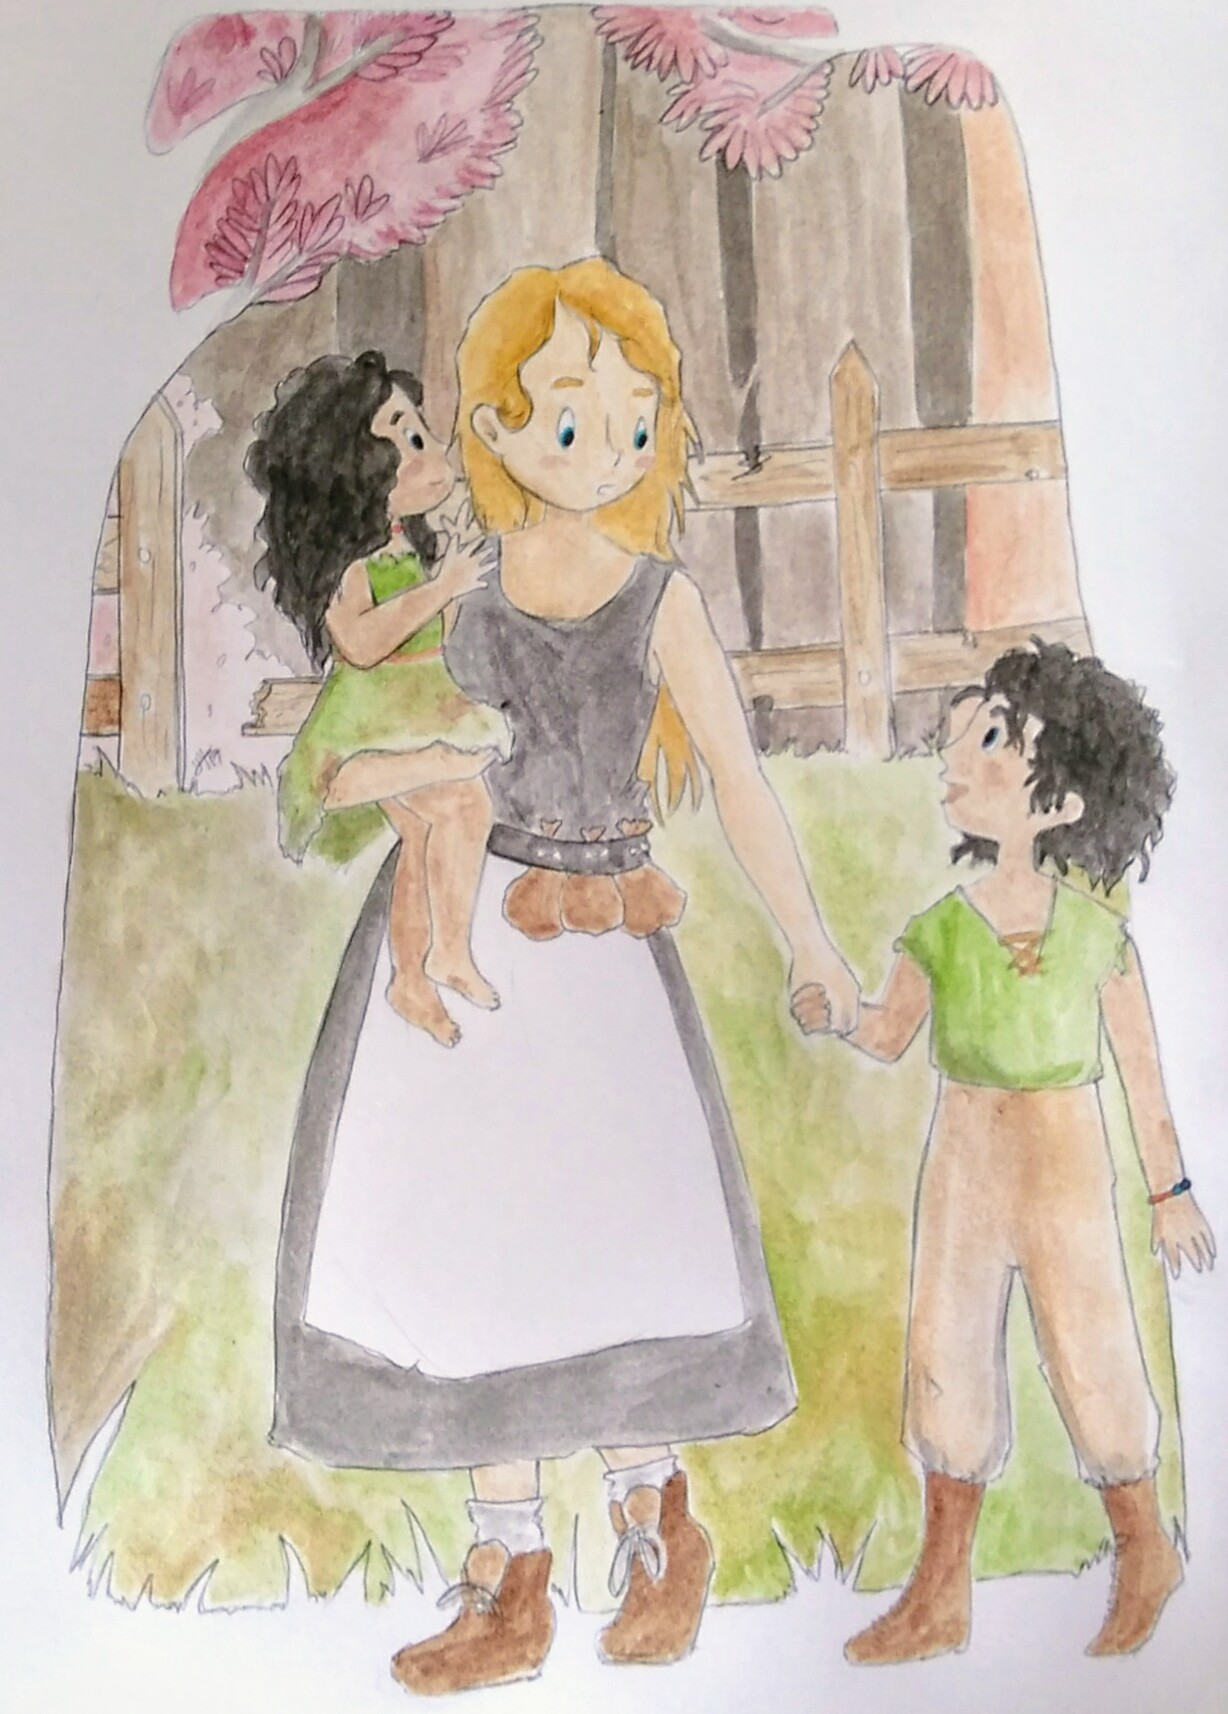 Lylianna devenant la maman d'Alyssa et Jerod